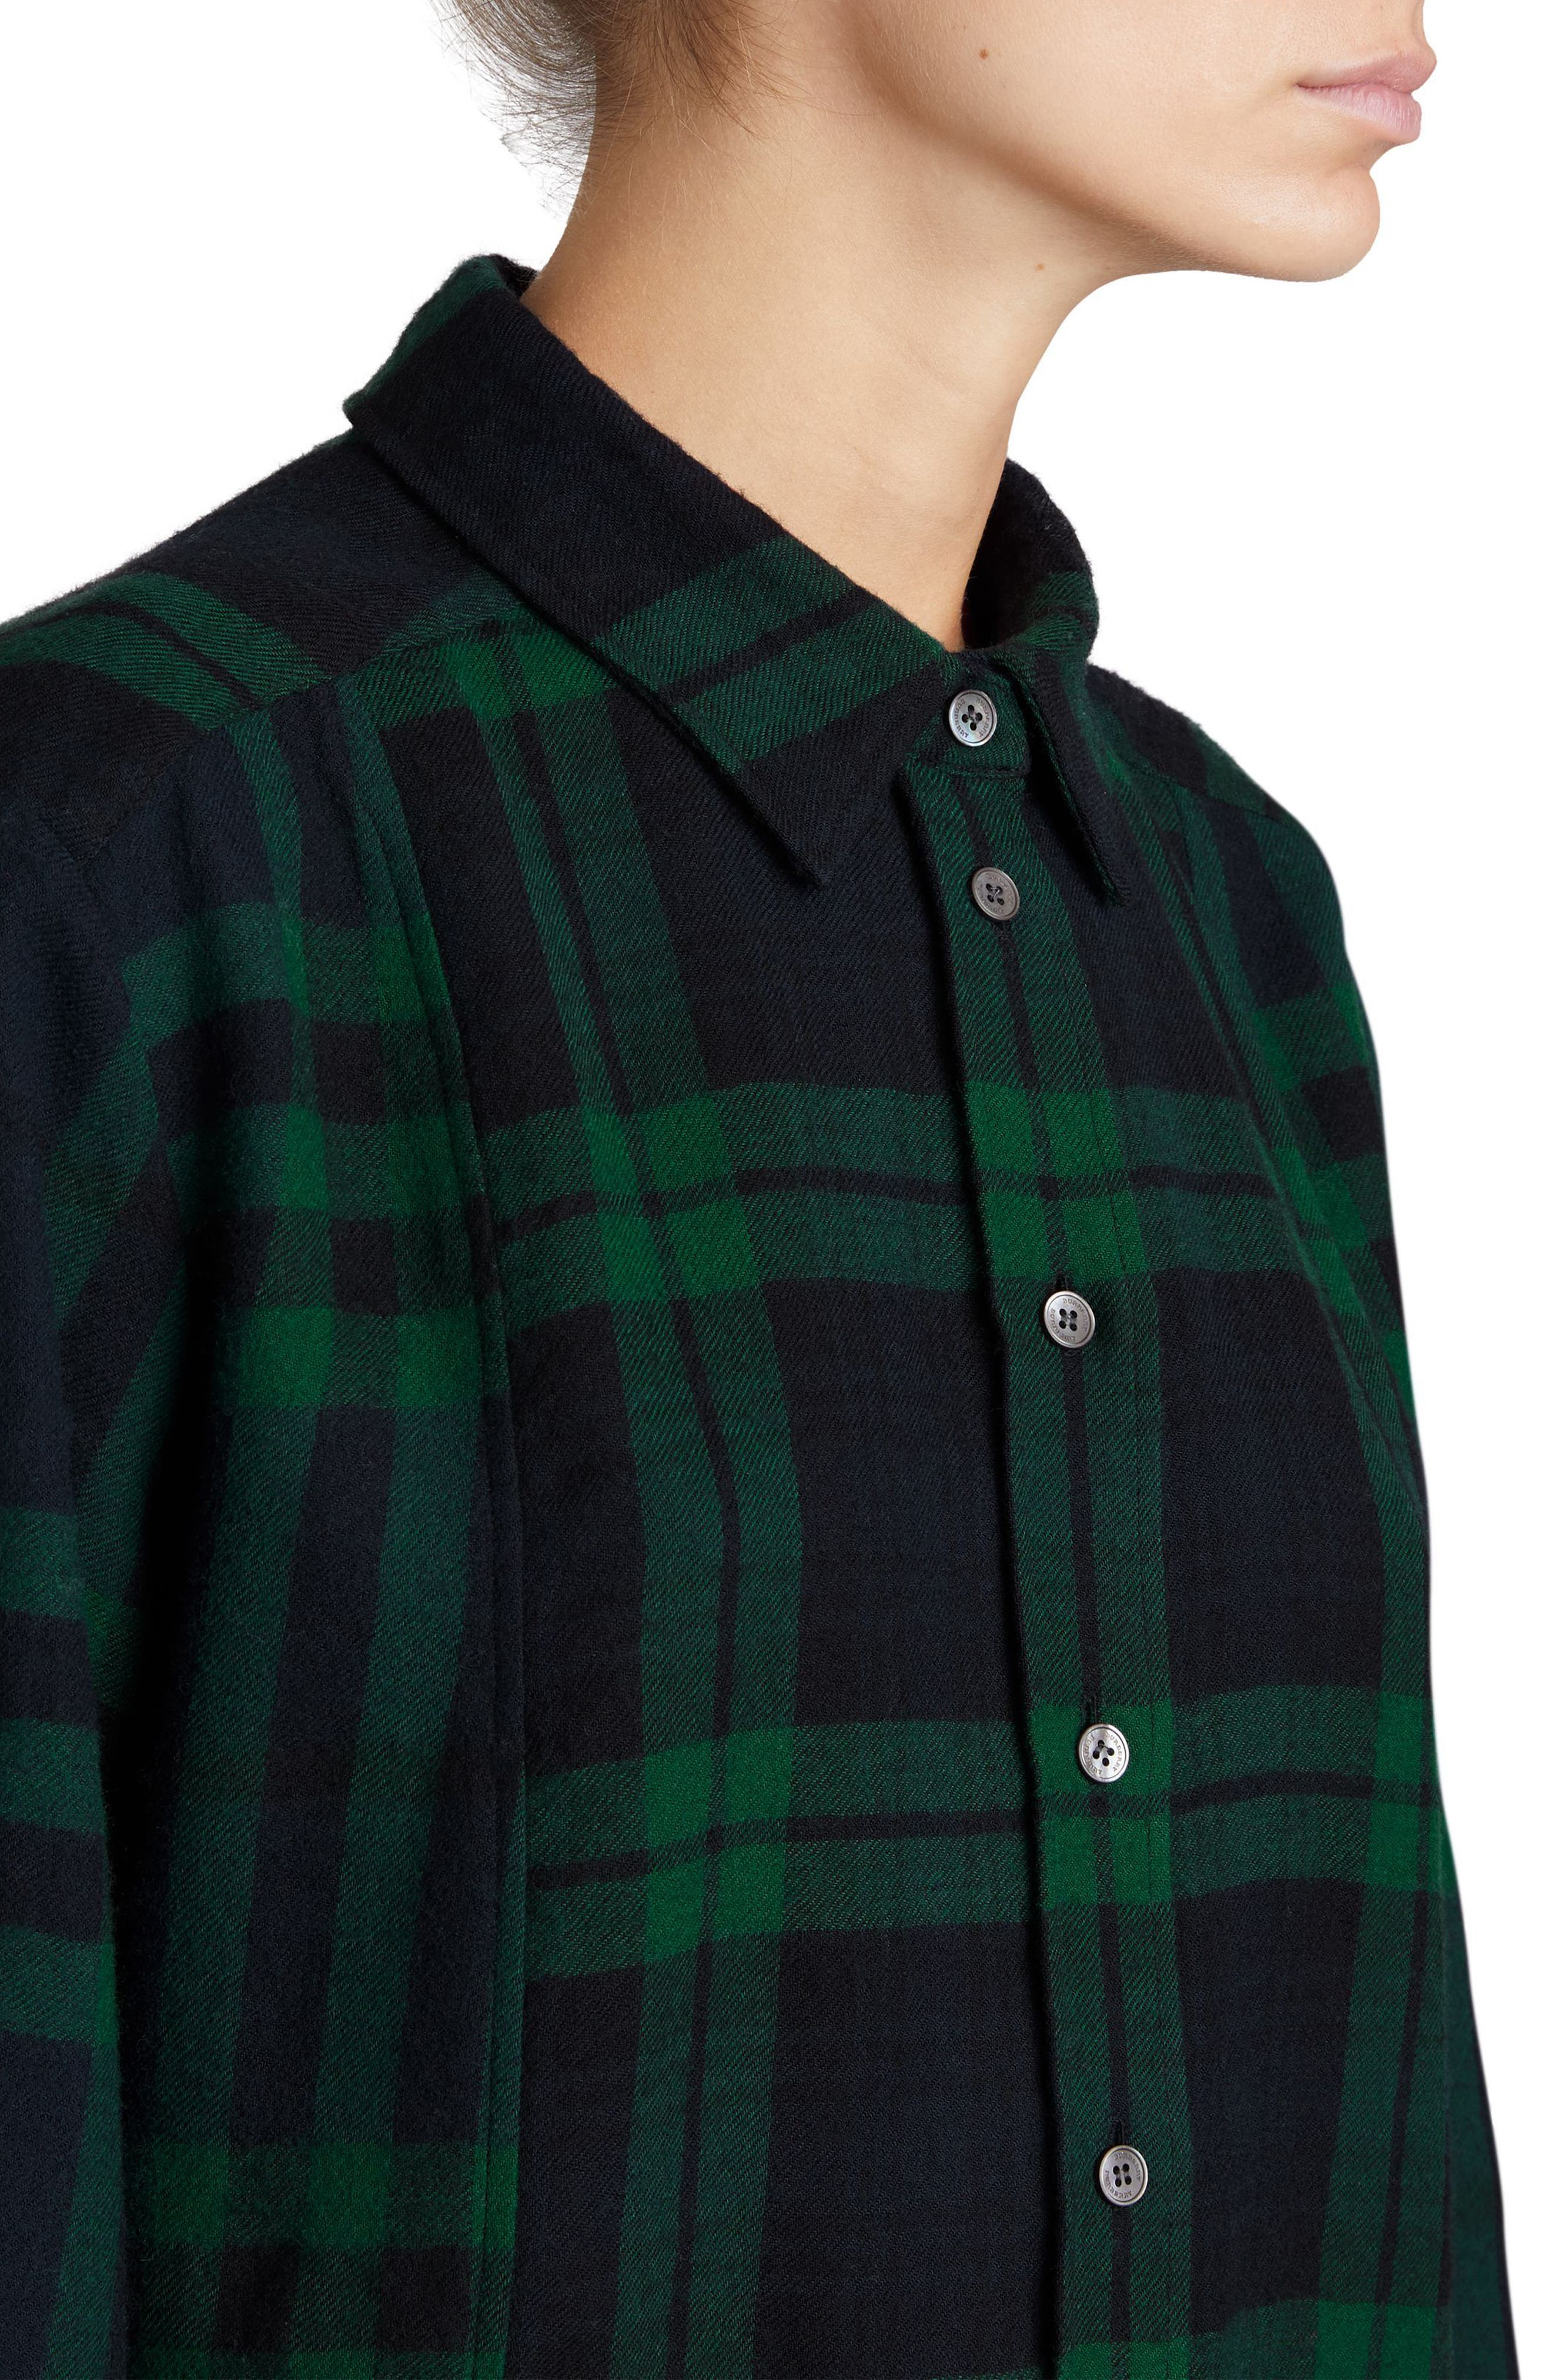 Kylie Check Wool Shirtdress,                             Alternate thumbnail 4, color,                             Navy